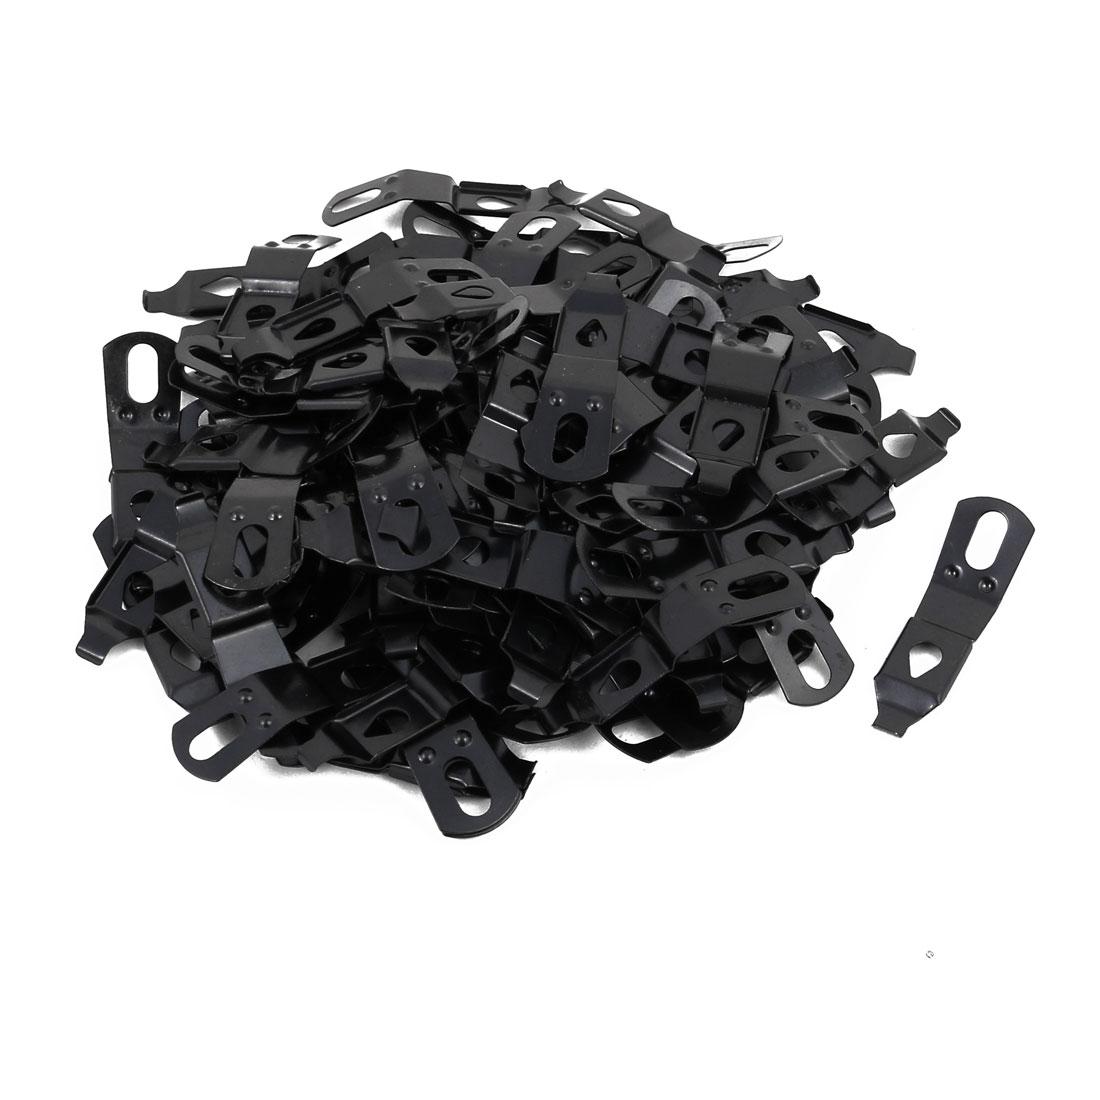 34.5mmx10mmx6mm Picture Photo Frame Metal Spring Turn Clip Hanger Black 100pcs